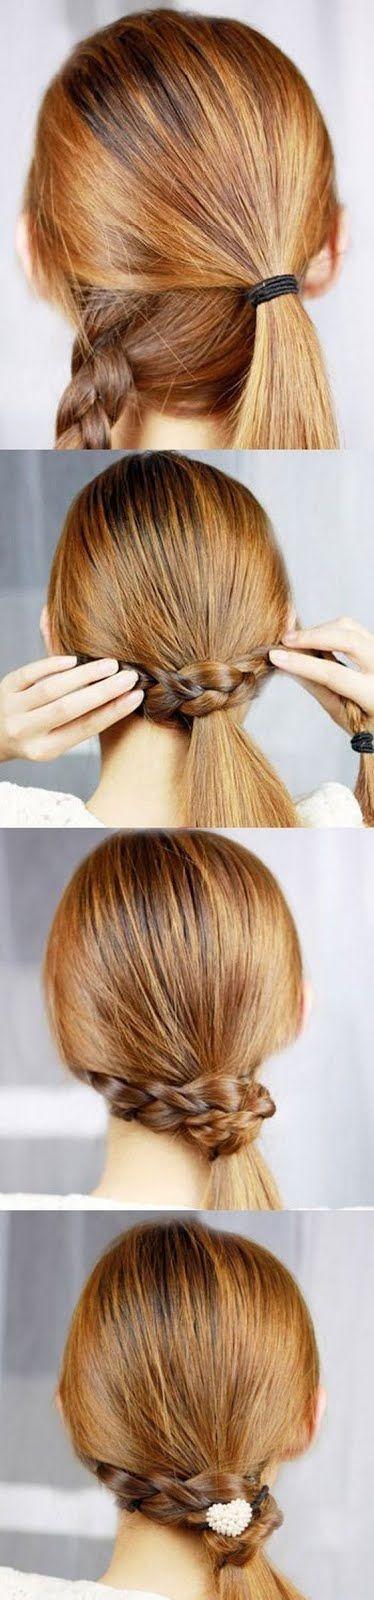 J U S T M PEINADOS FÁCILES Y RÁPIDOS! Hair! Pinterest Peinado